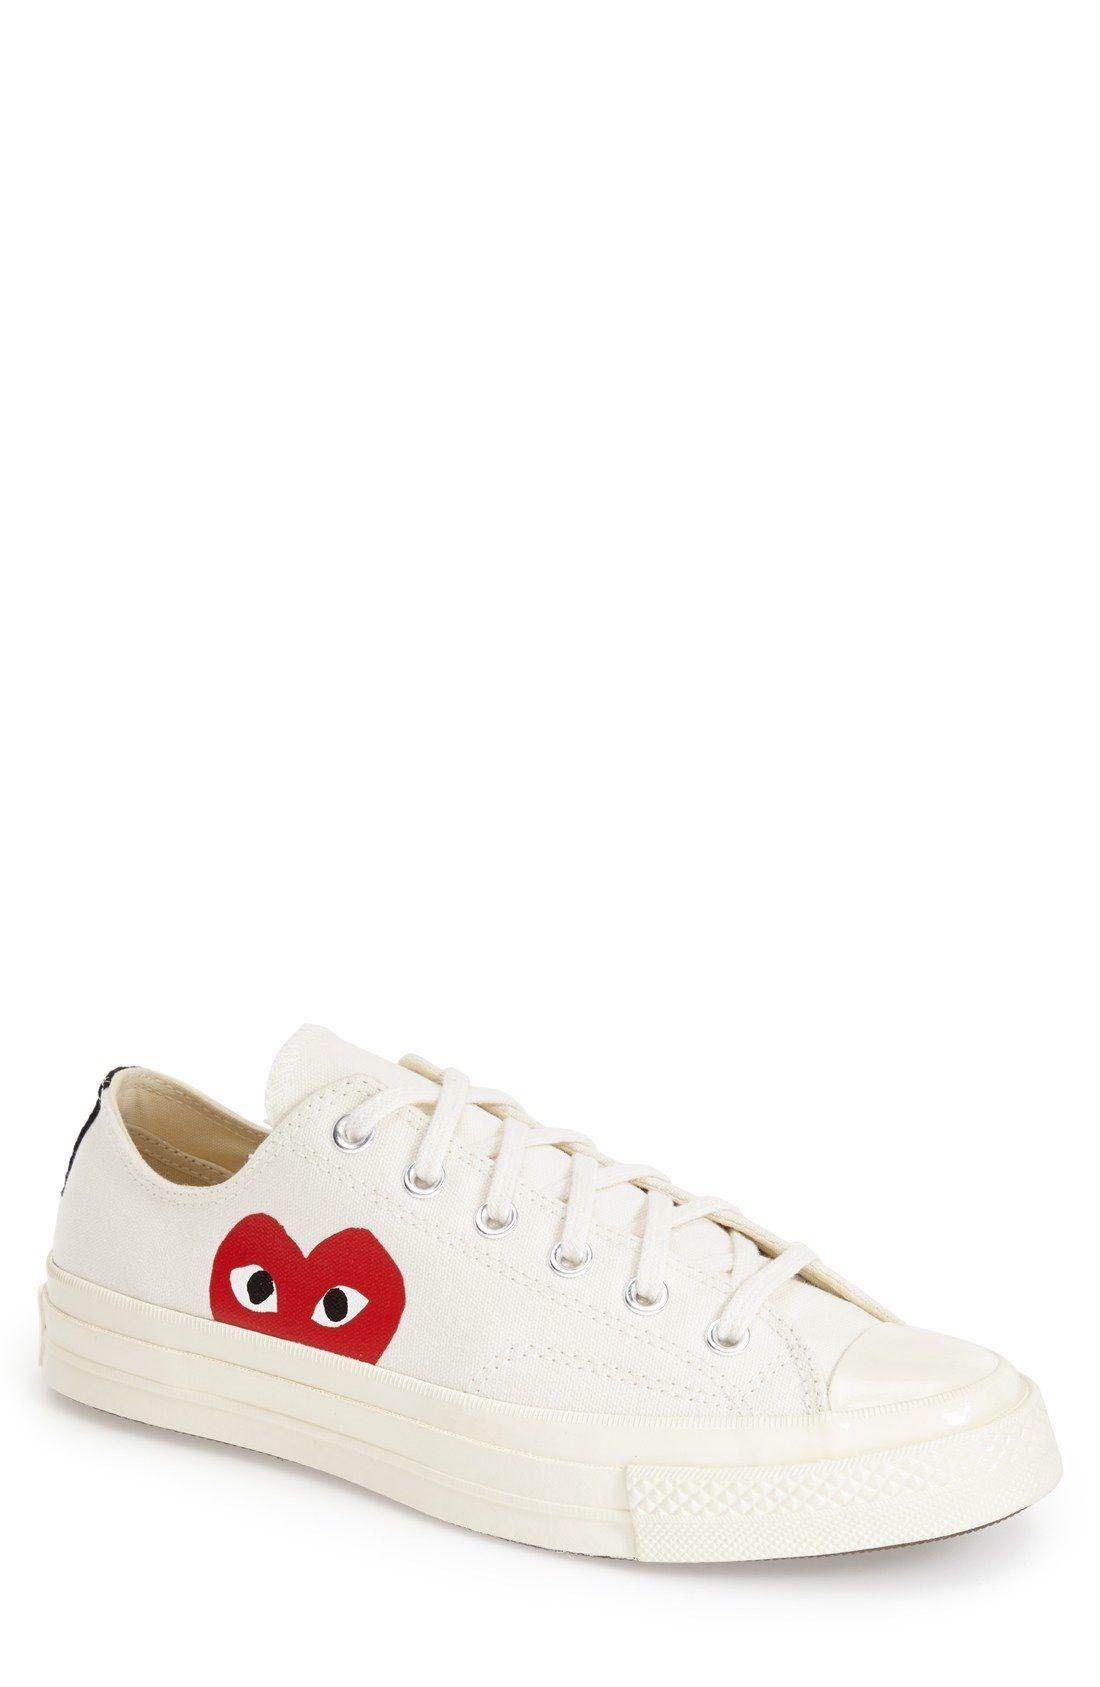 99d9ea066966 Comme des Garçons PLAY x Converse Chuck Taylor® Low Top Sneaker (Men)  available at  Nordstrom